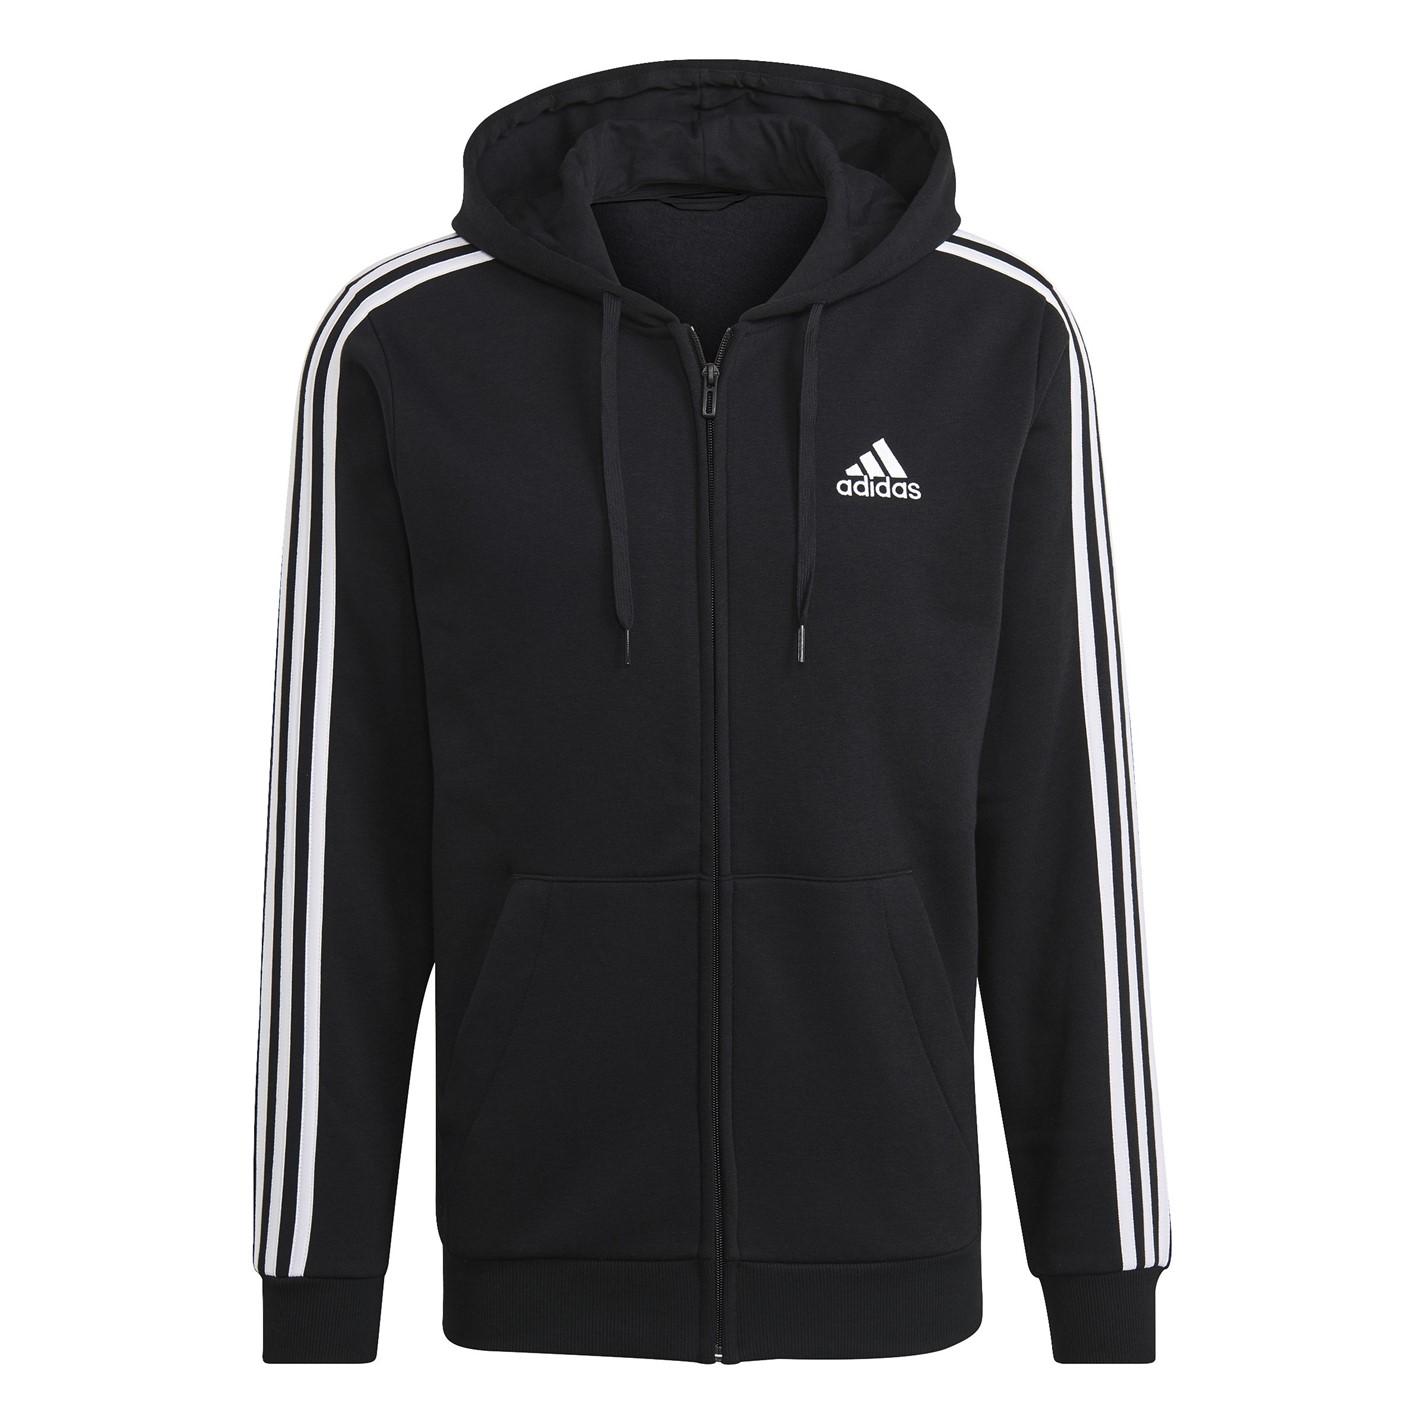 adidas 3 Stripes Zip Through pánská mikina Black White f737bba0d80